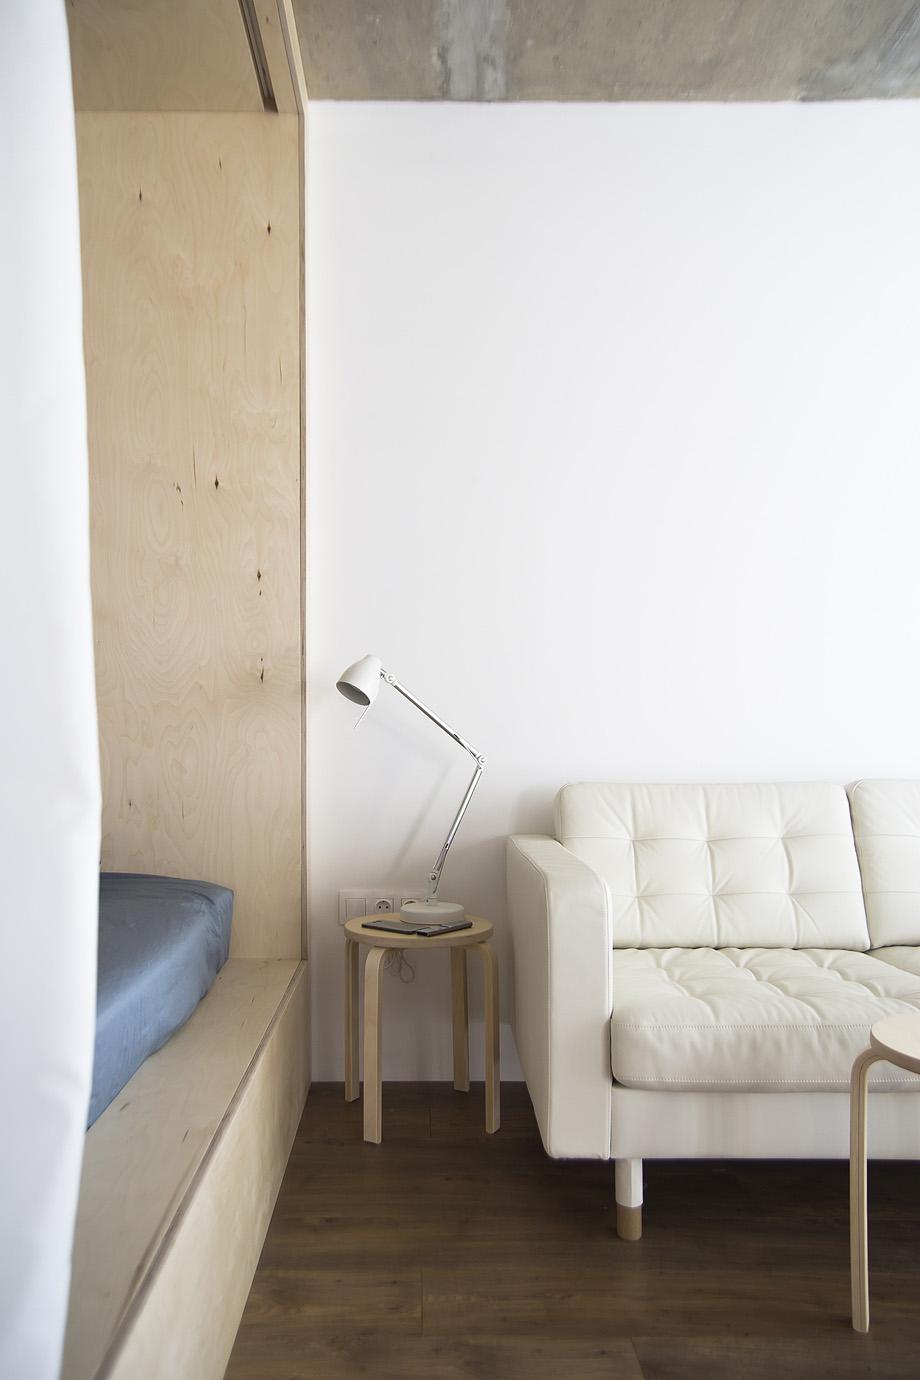 apartamento en rusia por kdva architects - foto daria koloskova (4)